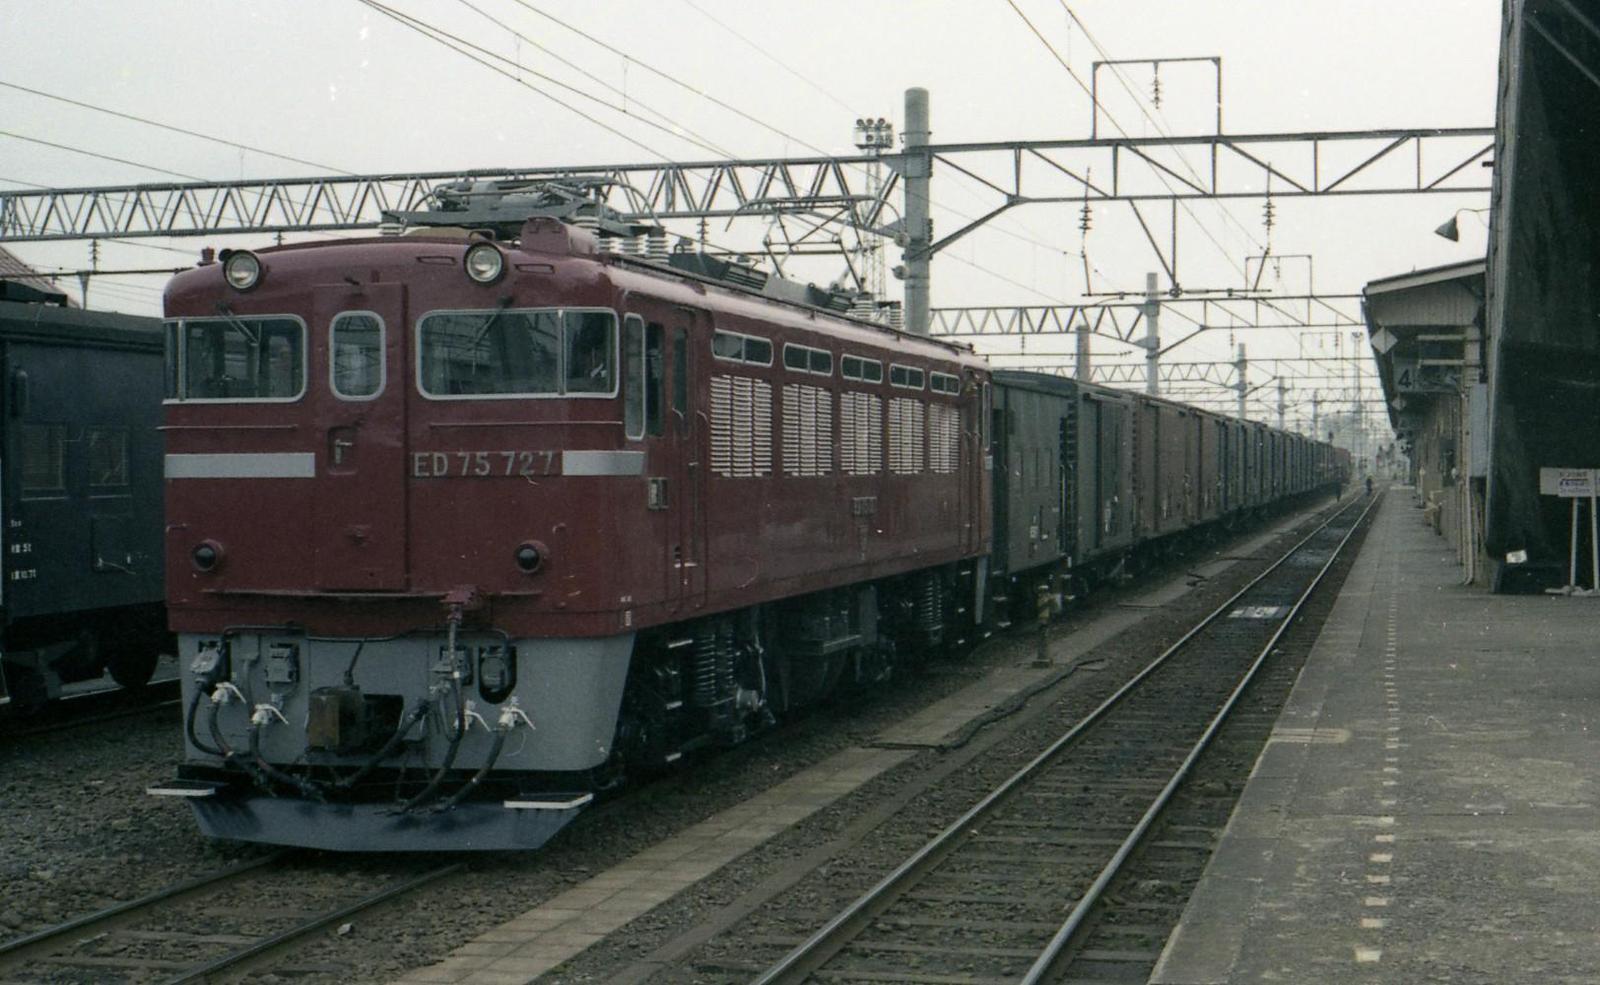 197810050623